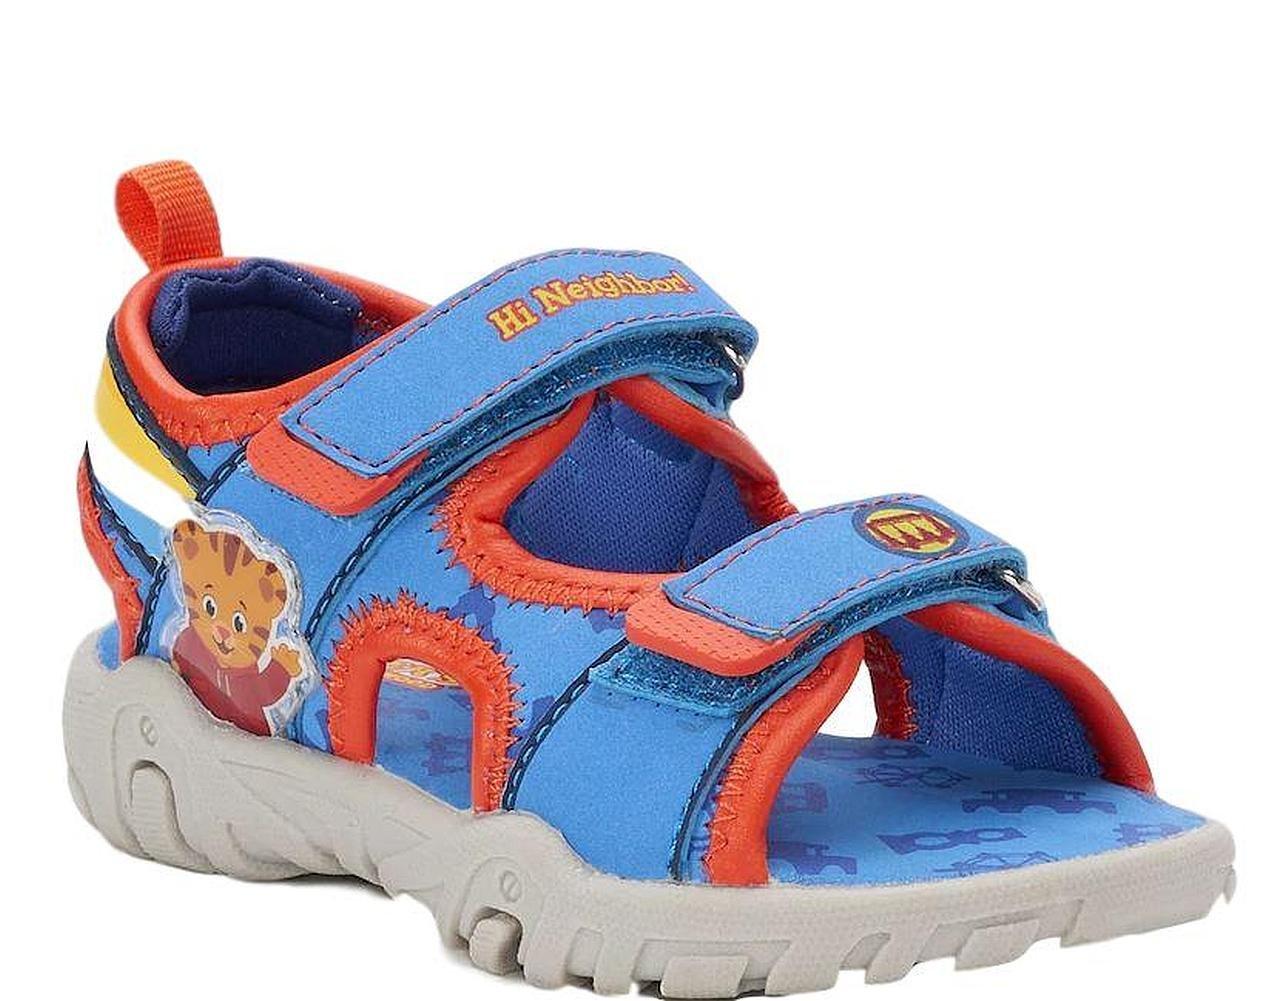 Daniel Tiger Neighborhood Sandal Flip Flop for Toddler Boys Summer Shoe (6 Medium)